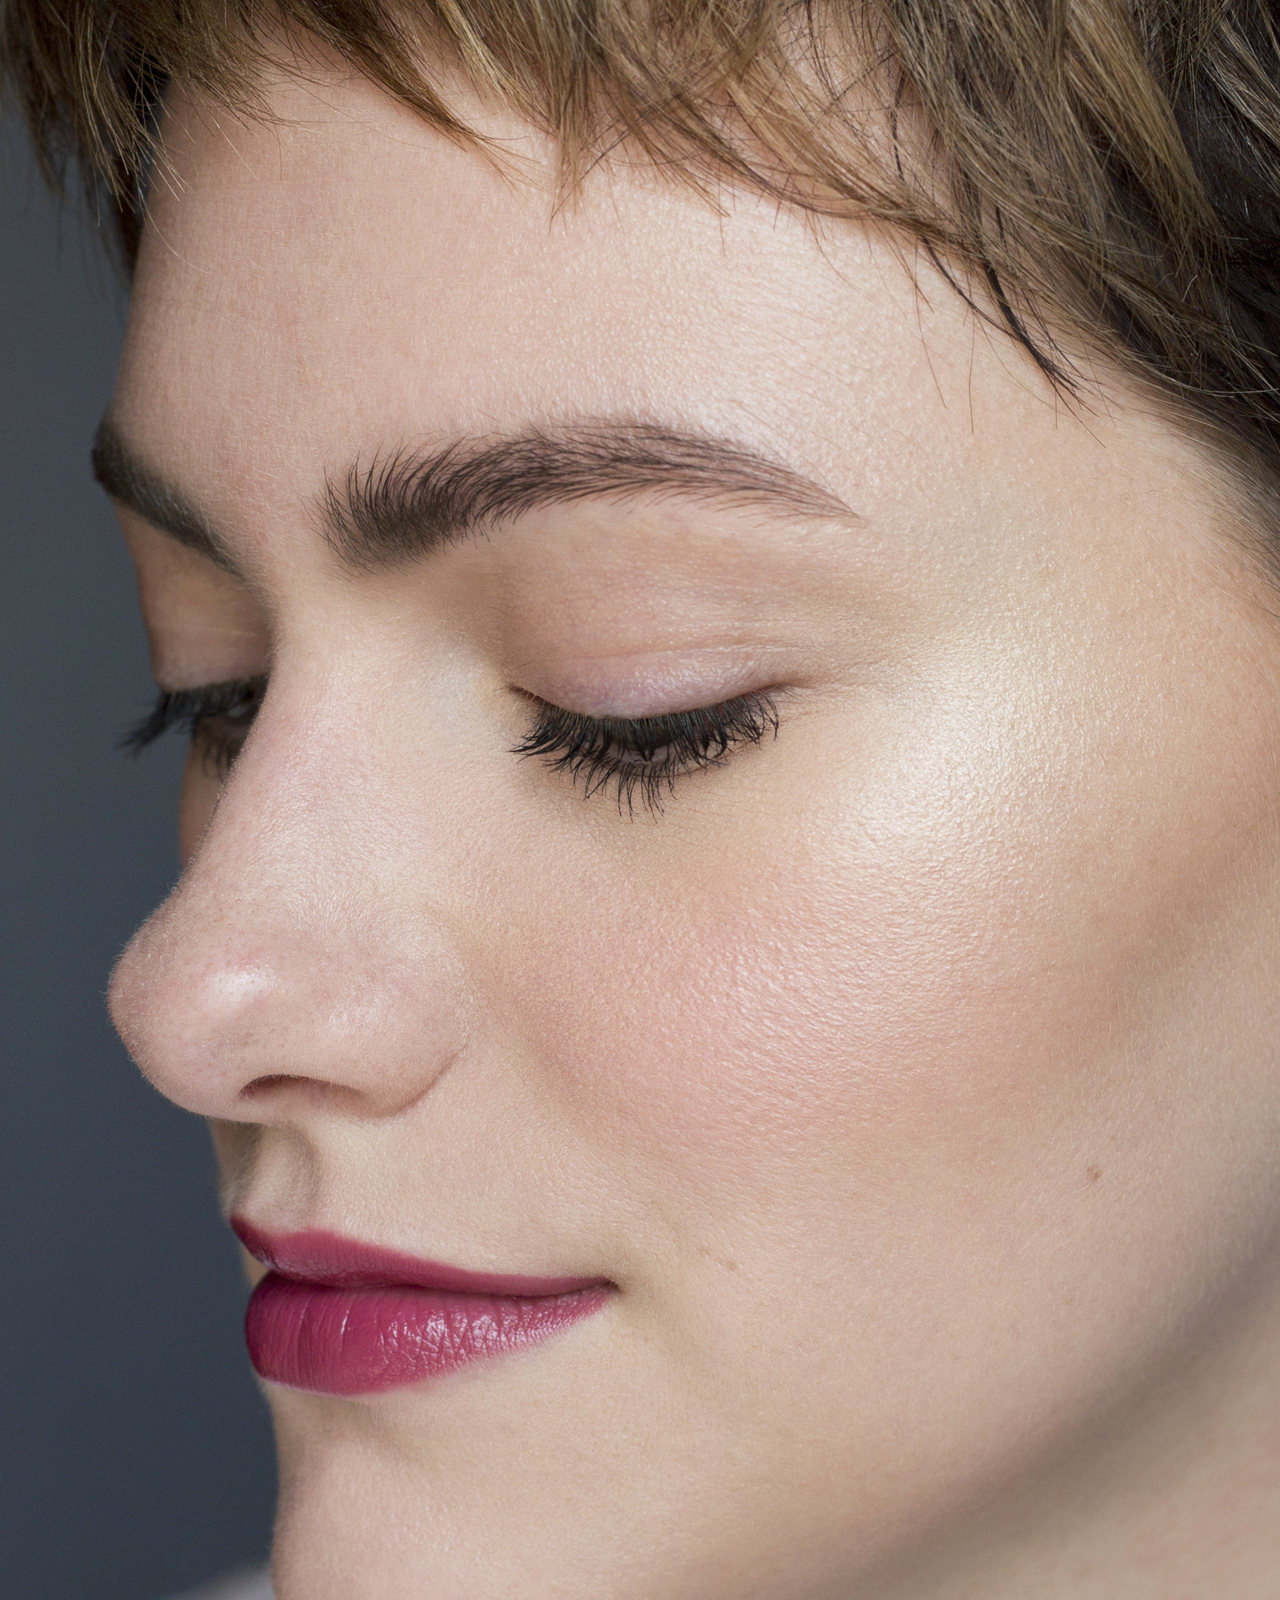 Bite Beauty Amuse Bouche Liquified Lipstick in Mauvember Close Up